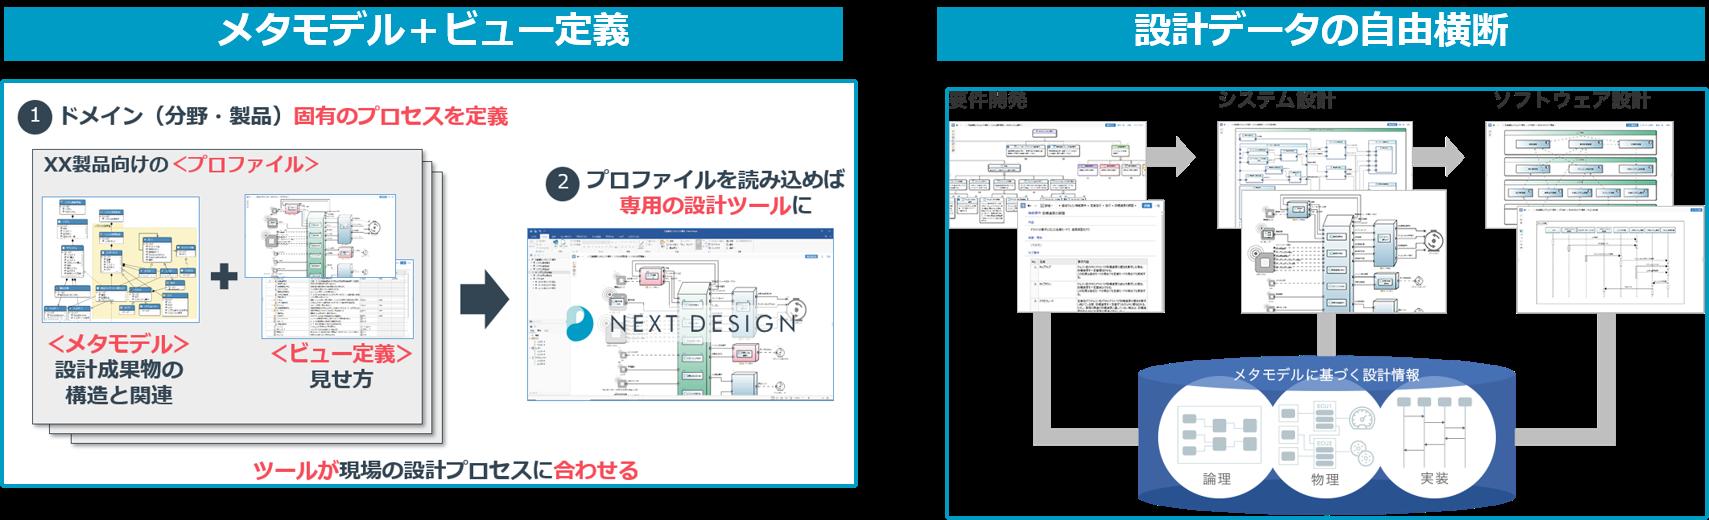 img_press_Next Design_20211005